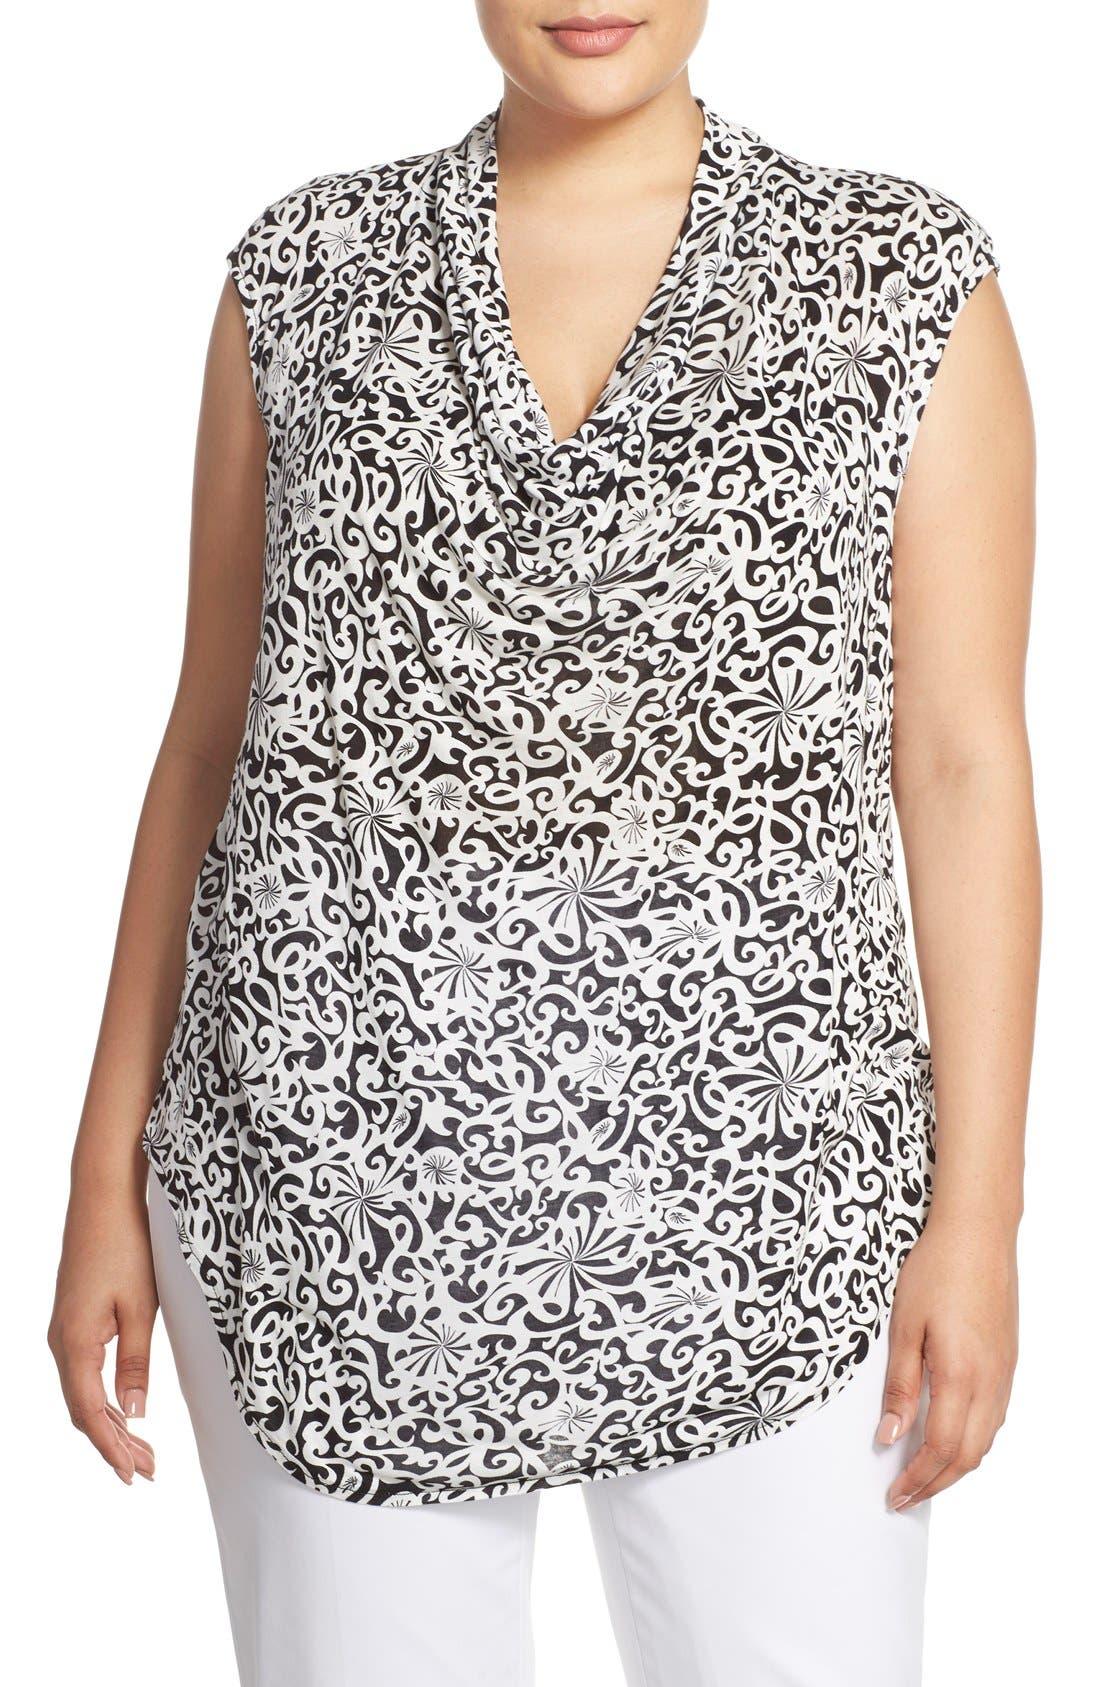 Alternate Image 1 Selected - Halogen® Drape Neck Sleeveless Top (Plus Size)